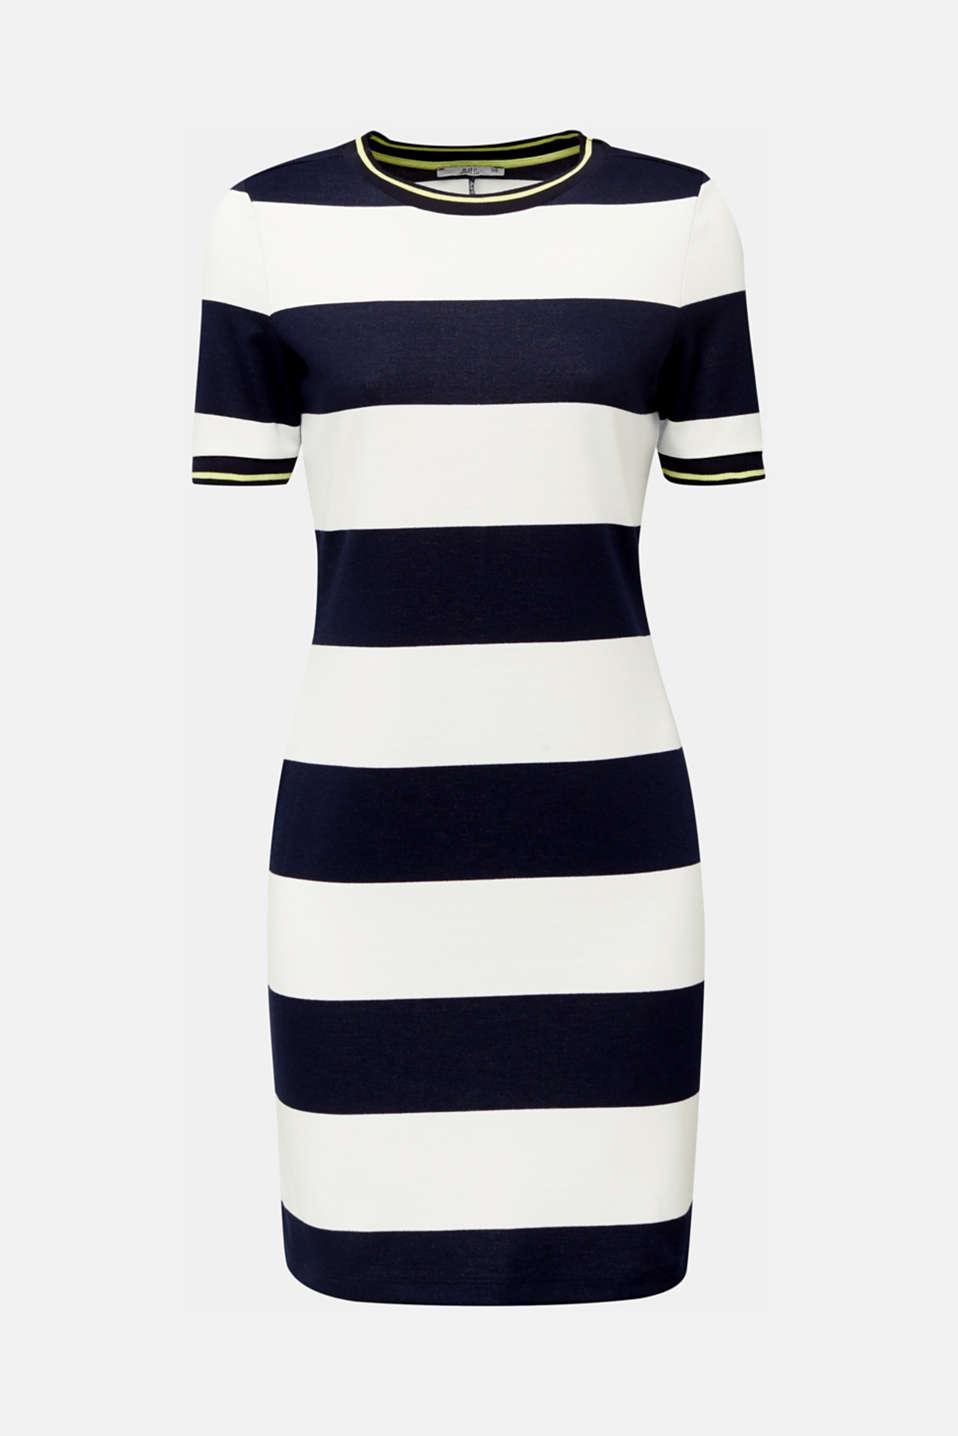 NEON piqué dress with luminous stripes, NAVY, detail image number 6